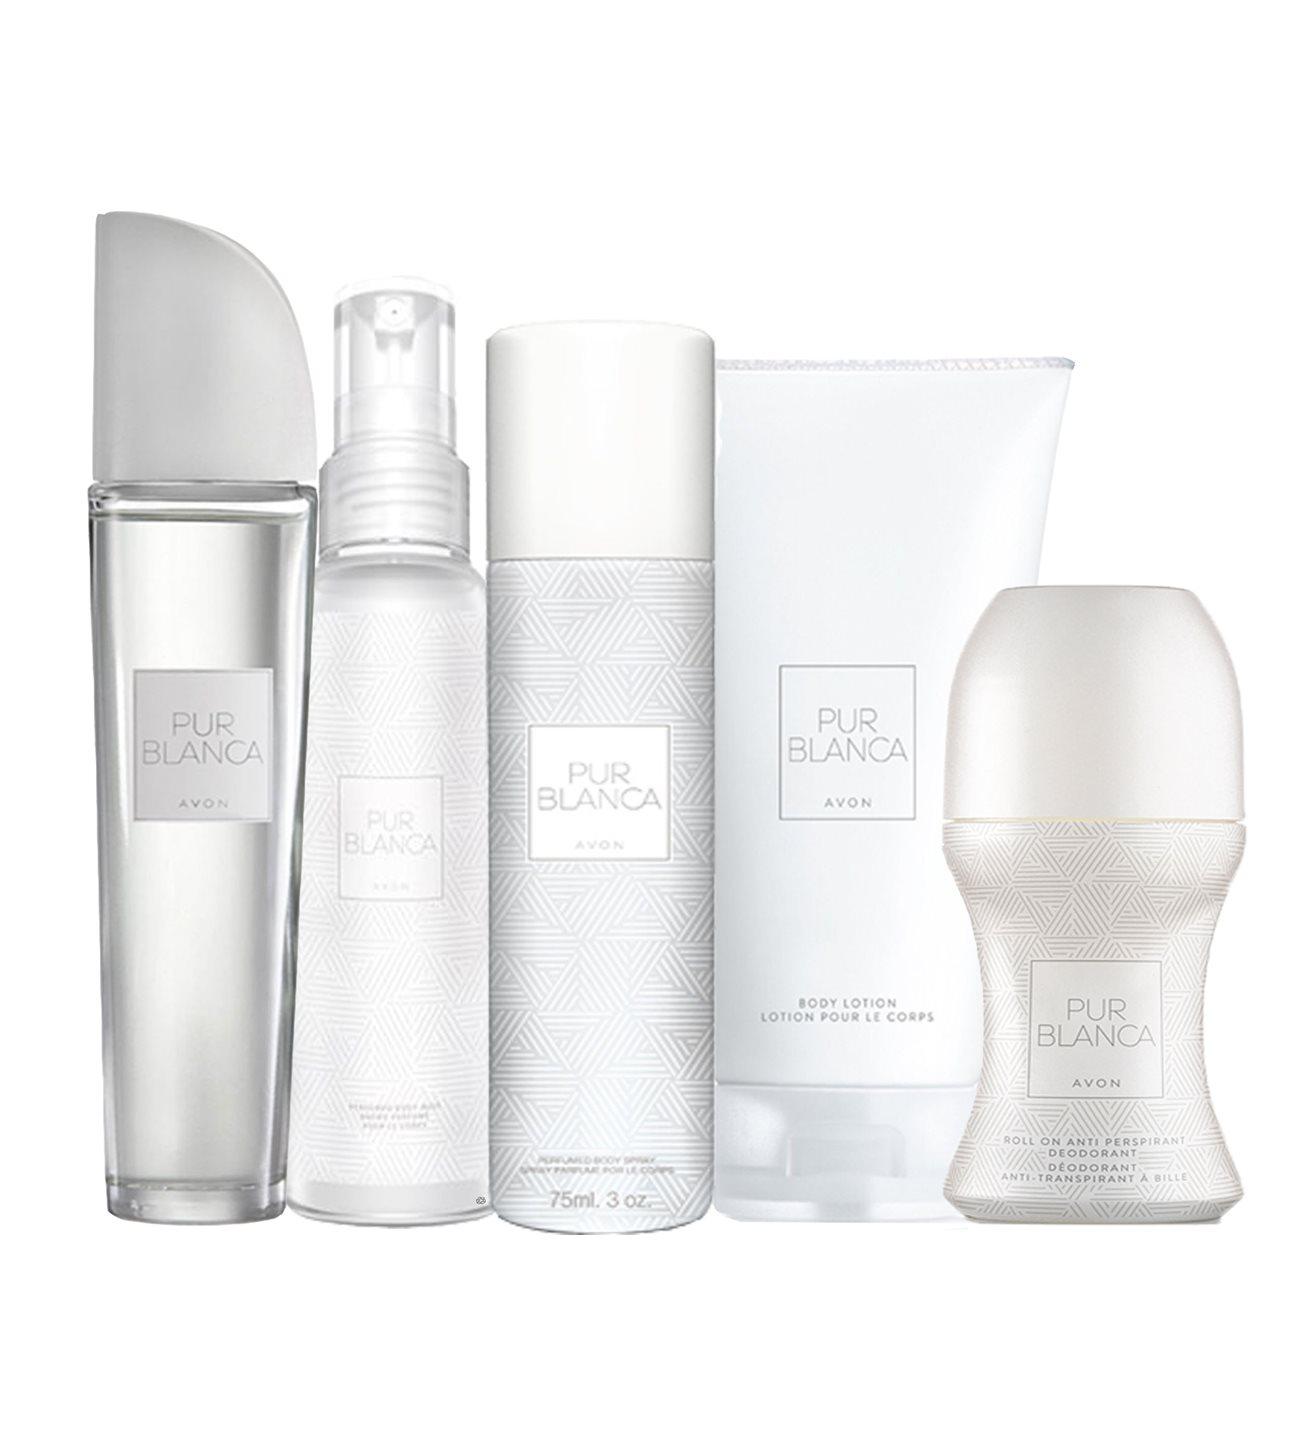 Pur Blanca 5-piece economic women's perfume set deodorant  lotion, spray, cream beautiful sexy pleasant lasting impressive